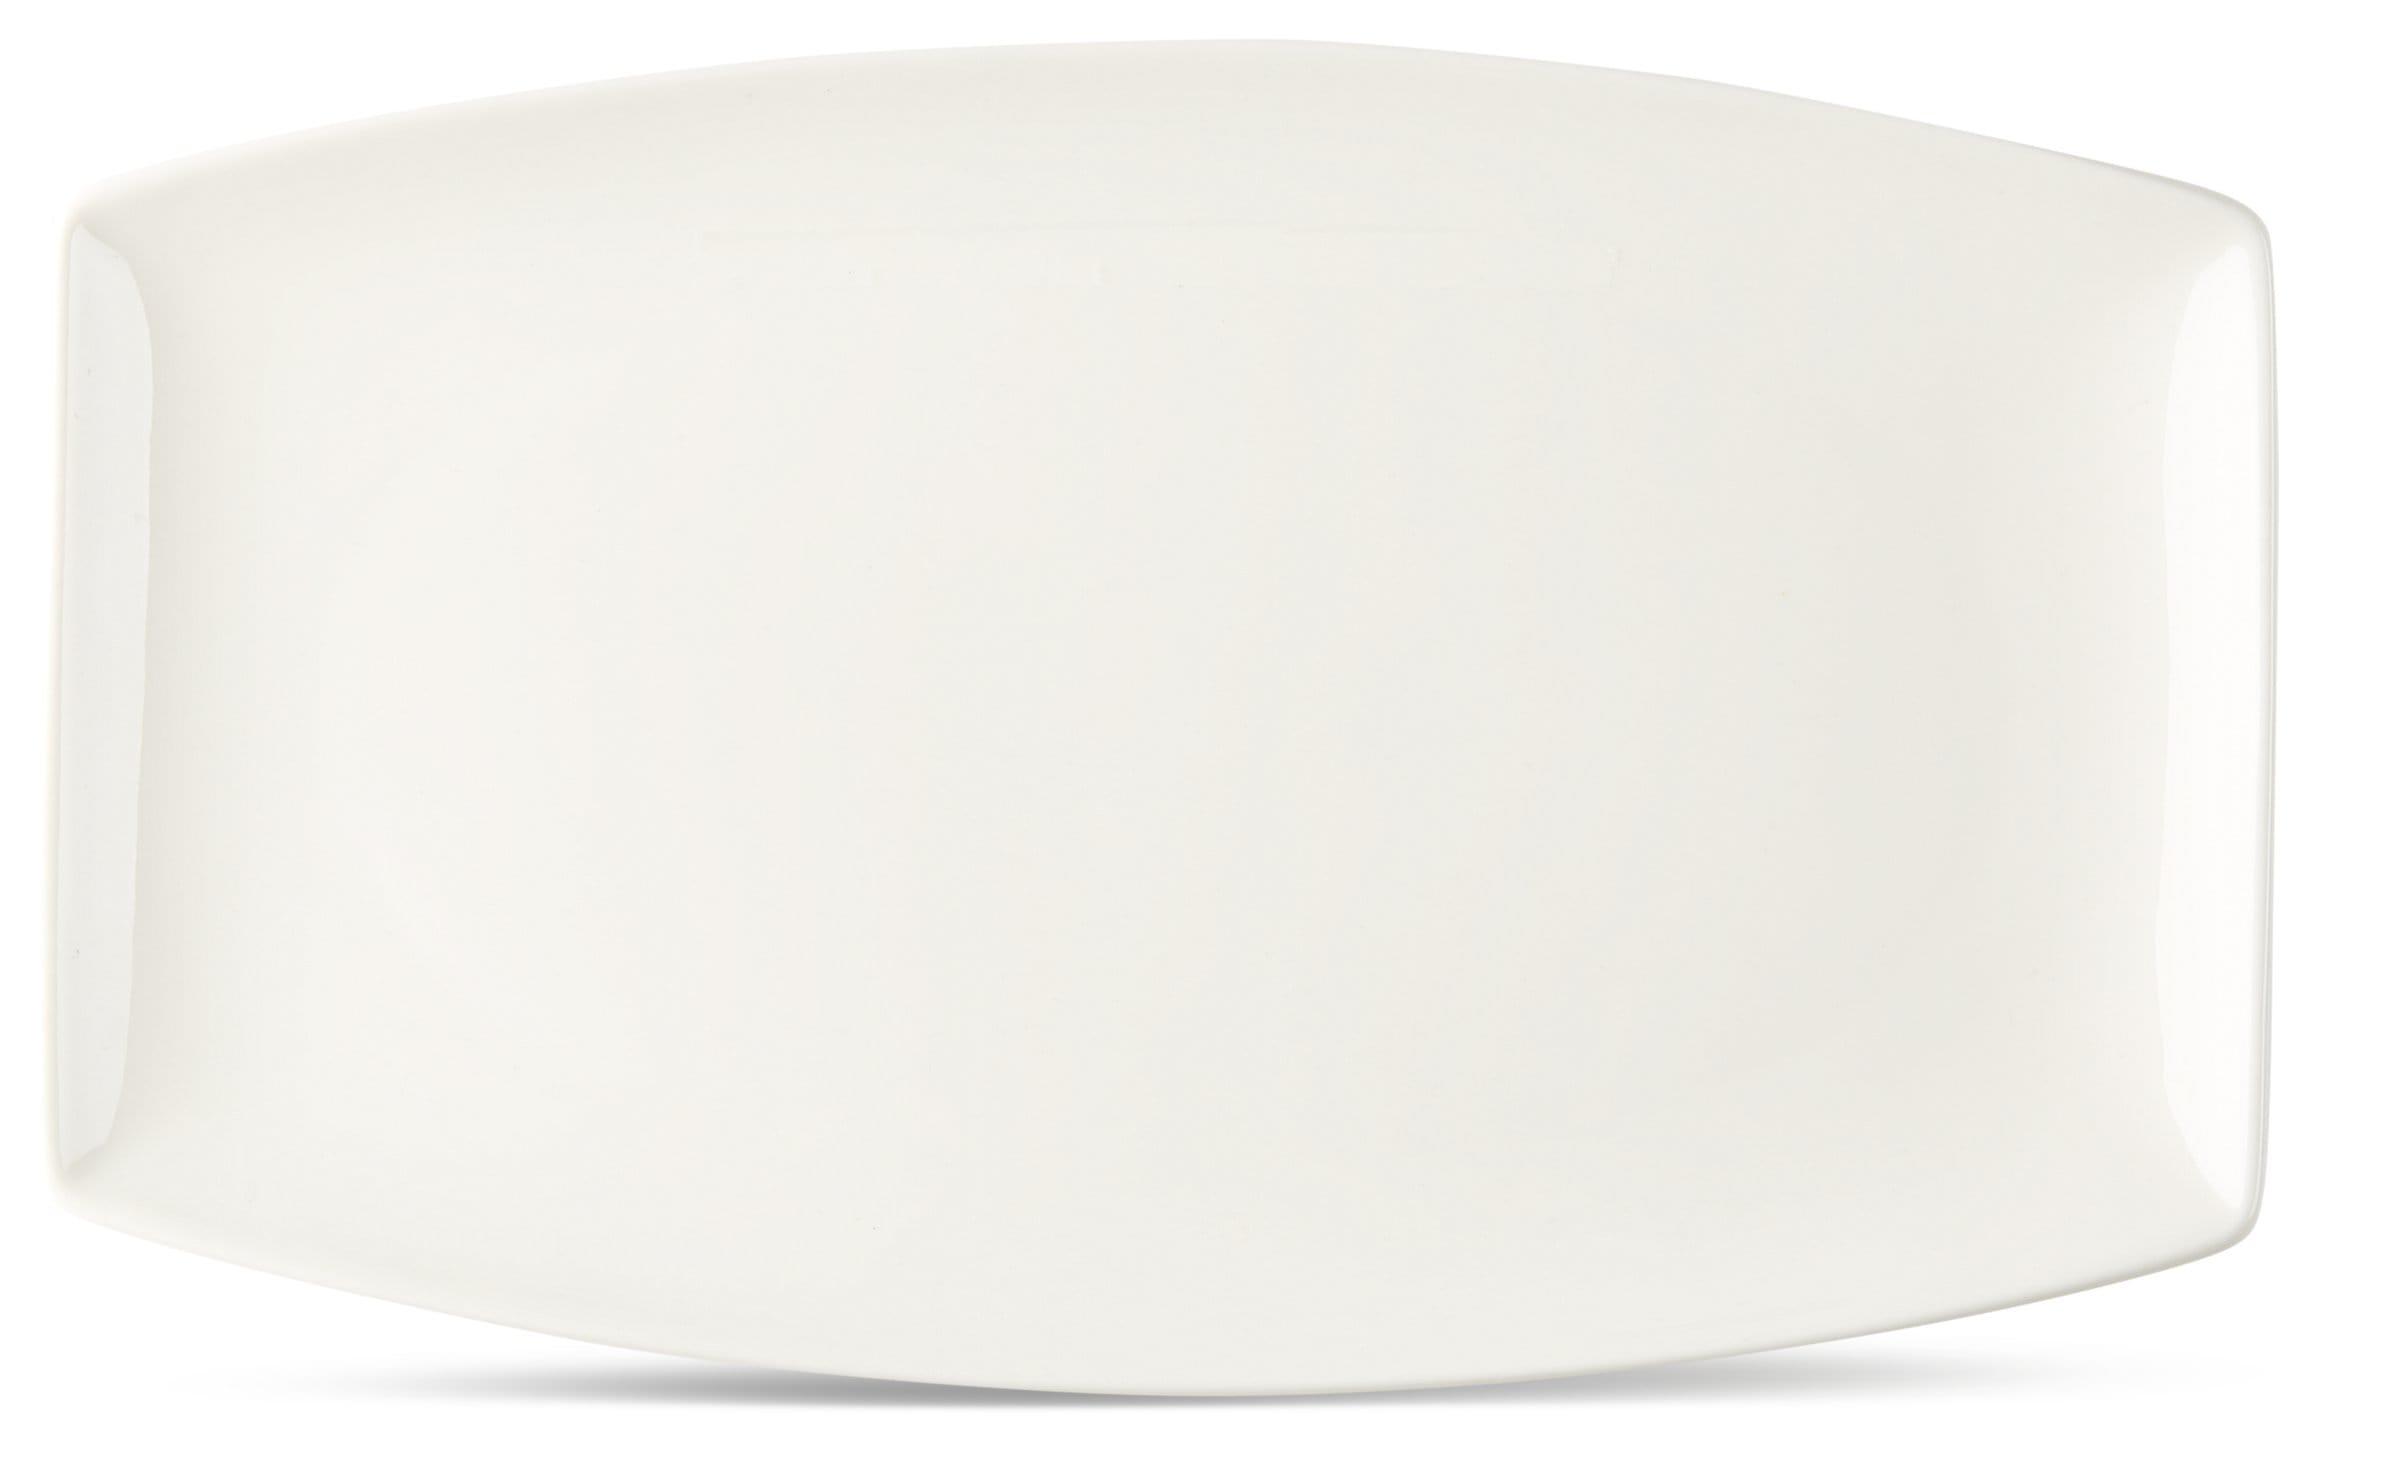 Cucina & Tavola FINE LINE Vassoio 22.5x14cm